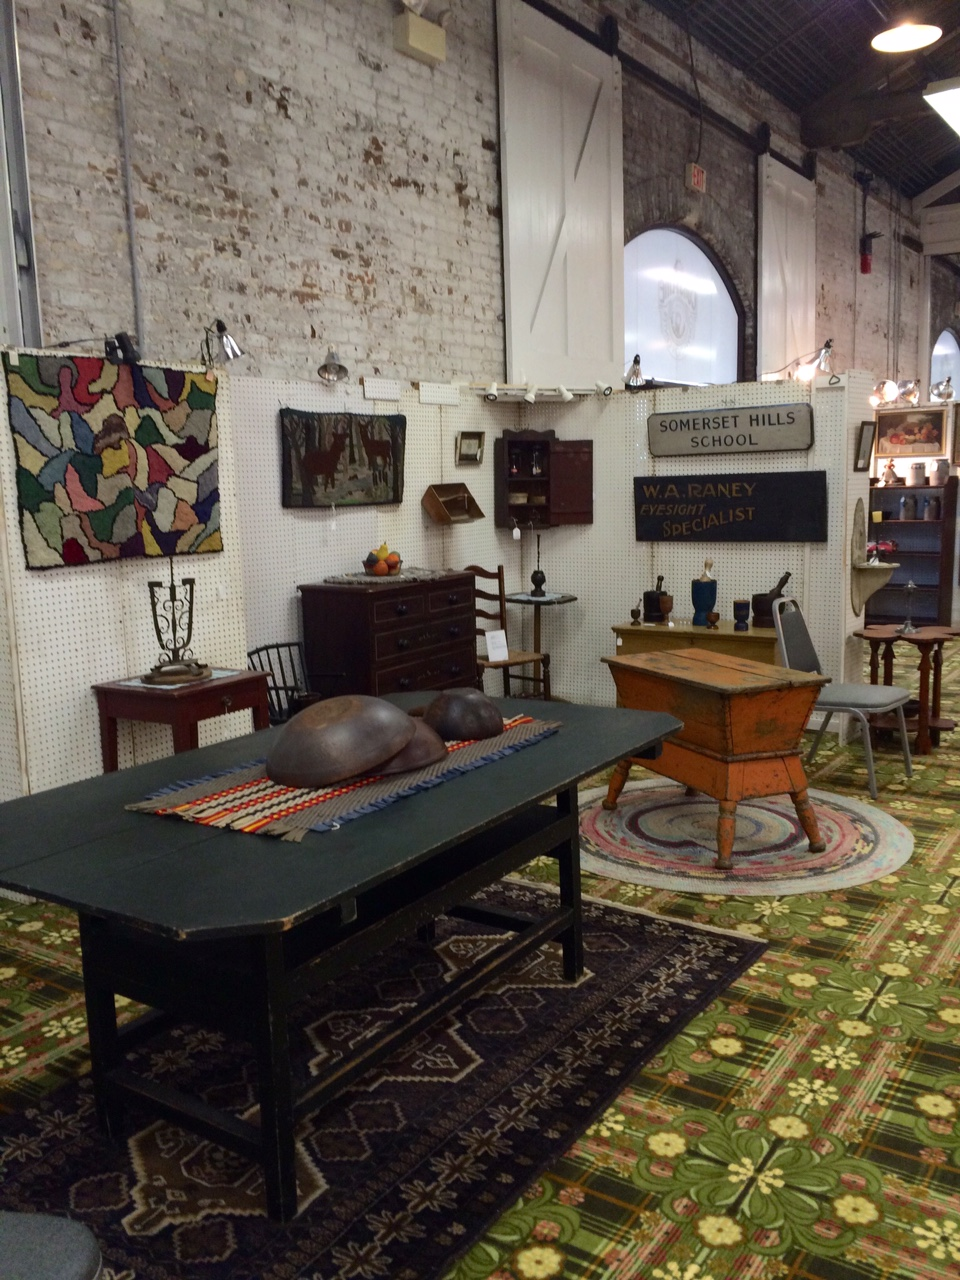 Wilmington Antique Show | January 18 20 2019